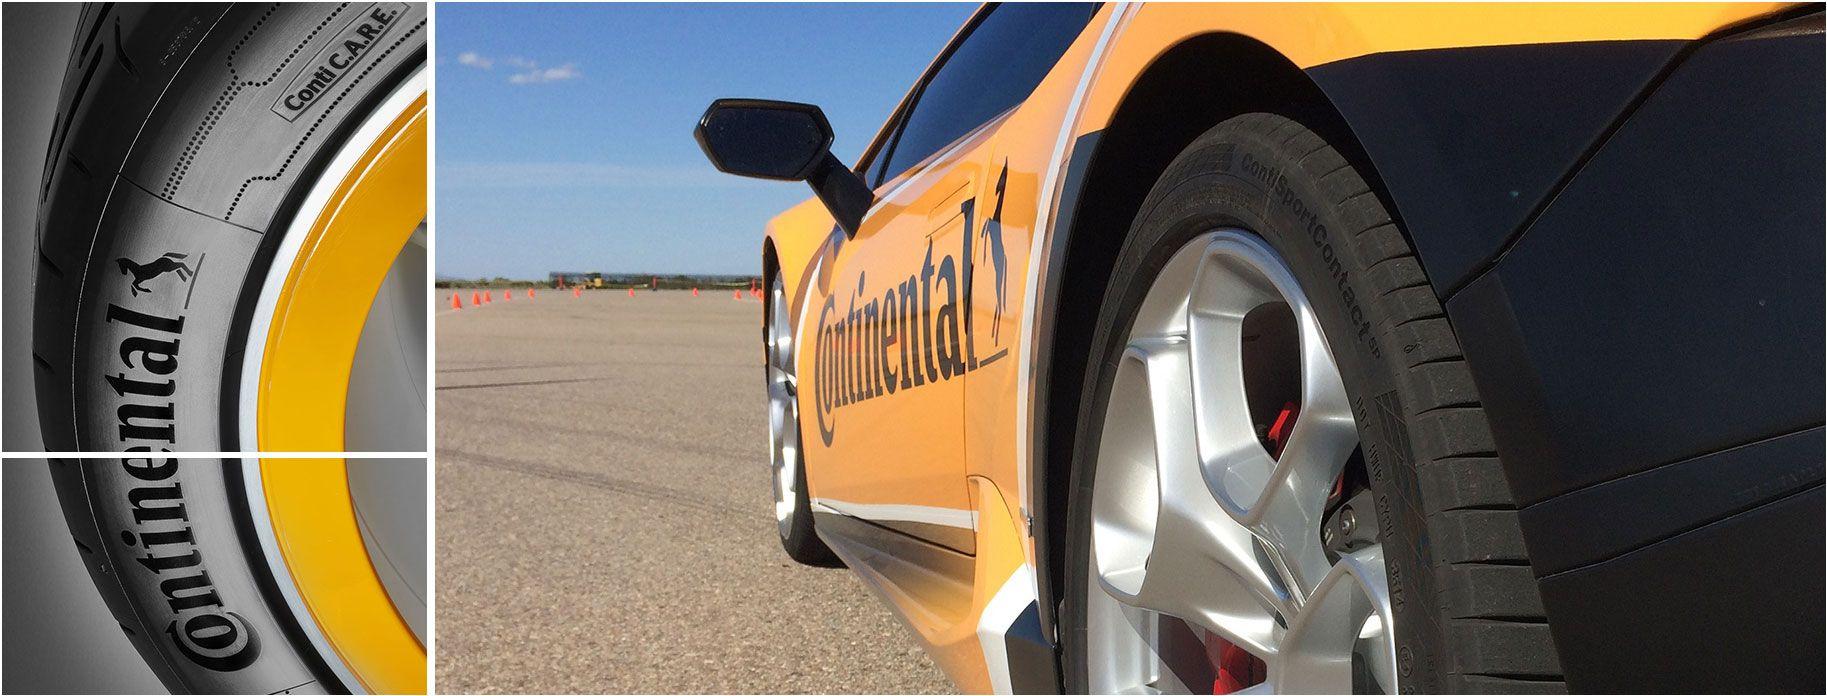 Continental Tyres UAE